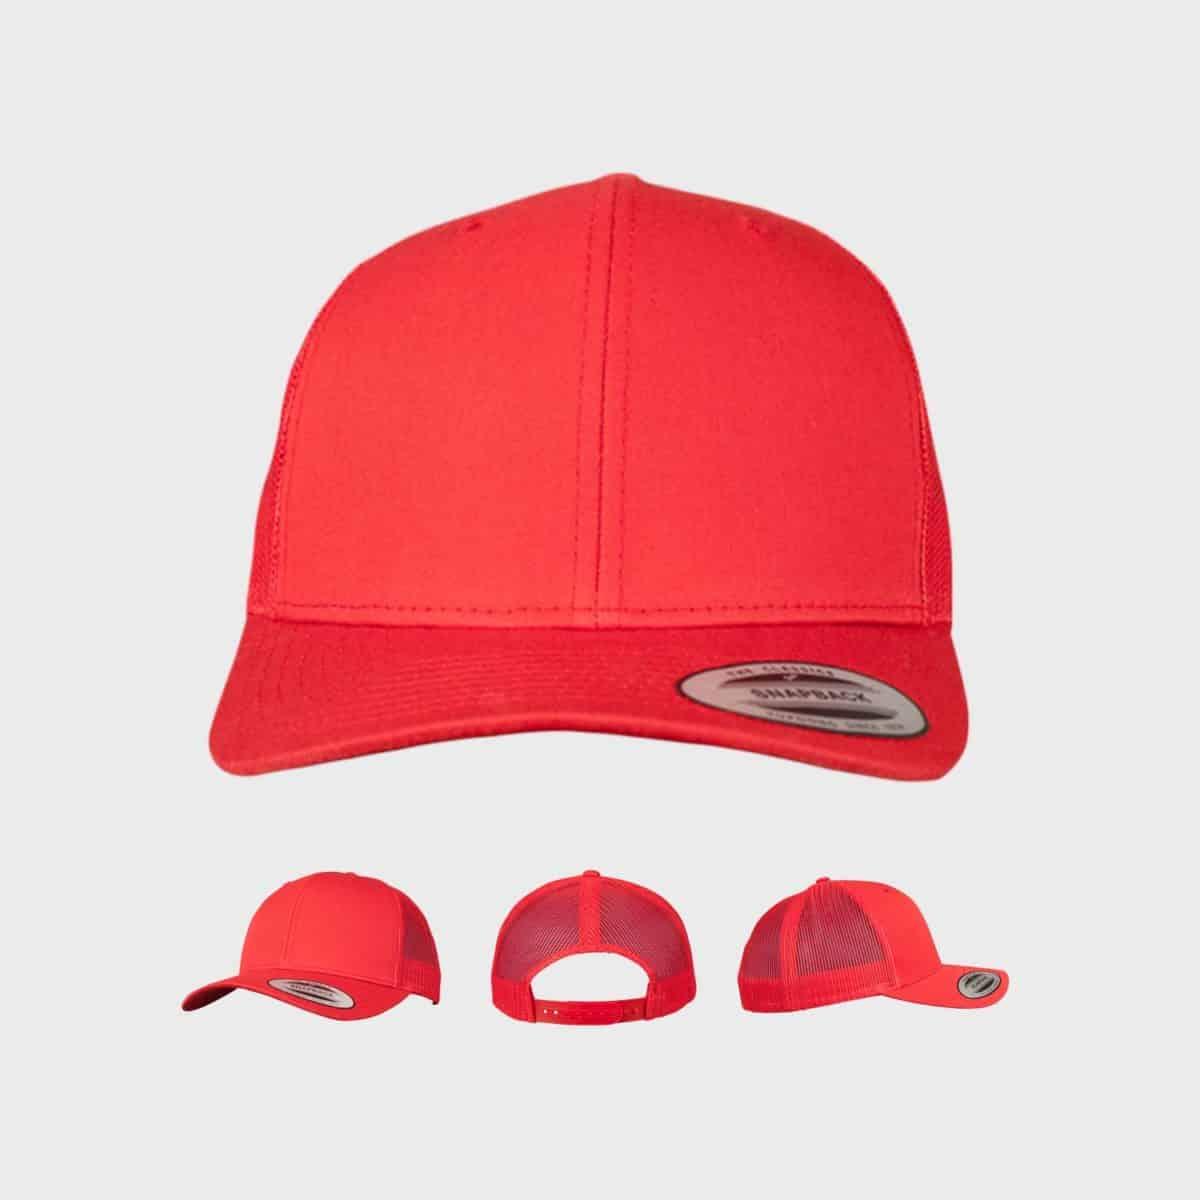 Flexfit FlexfitCaps FFE 6606 Red Front Extra